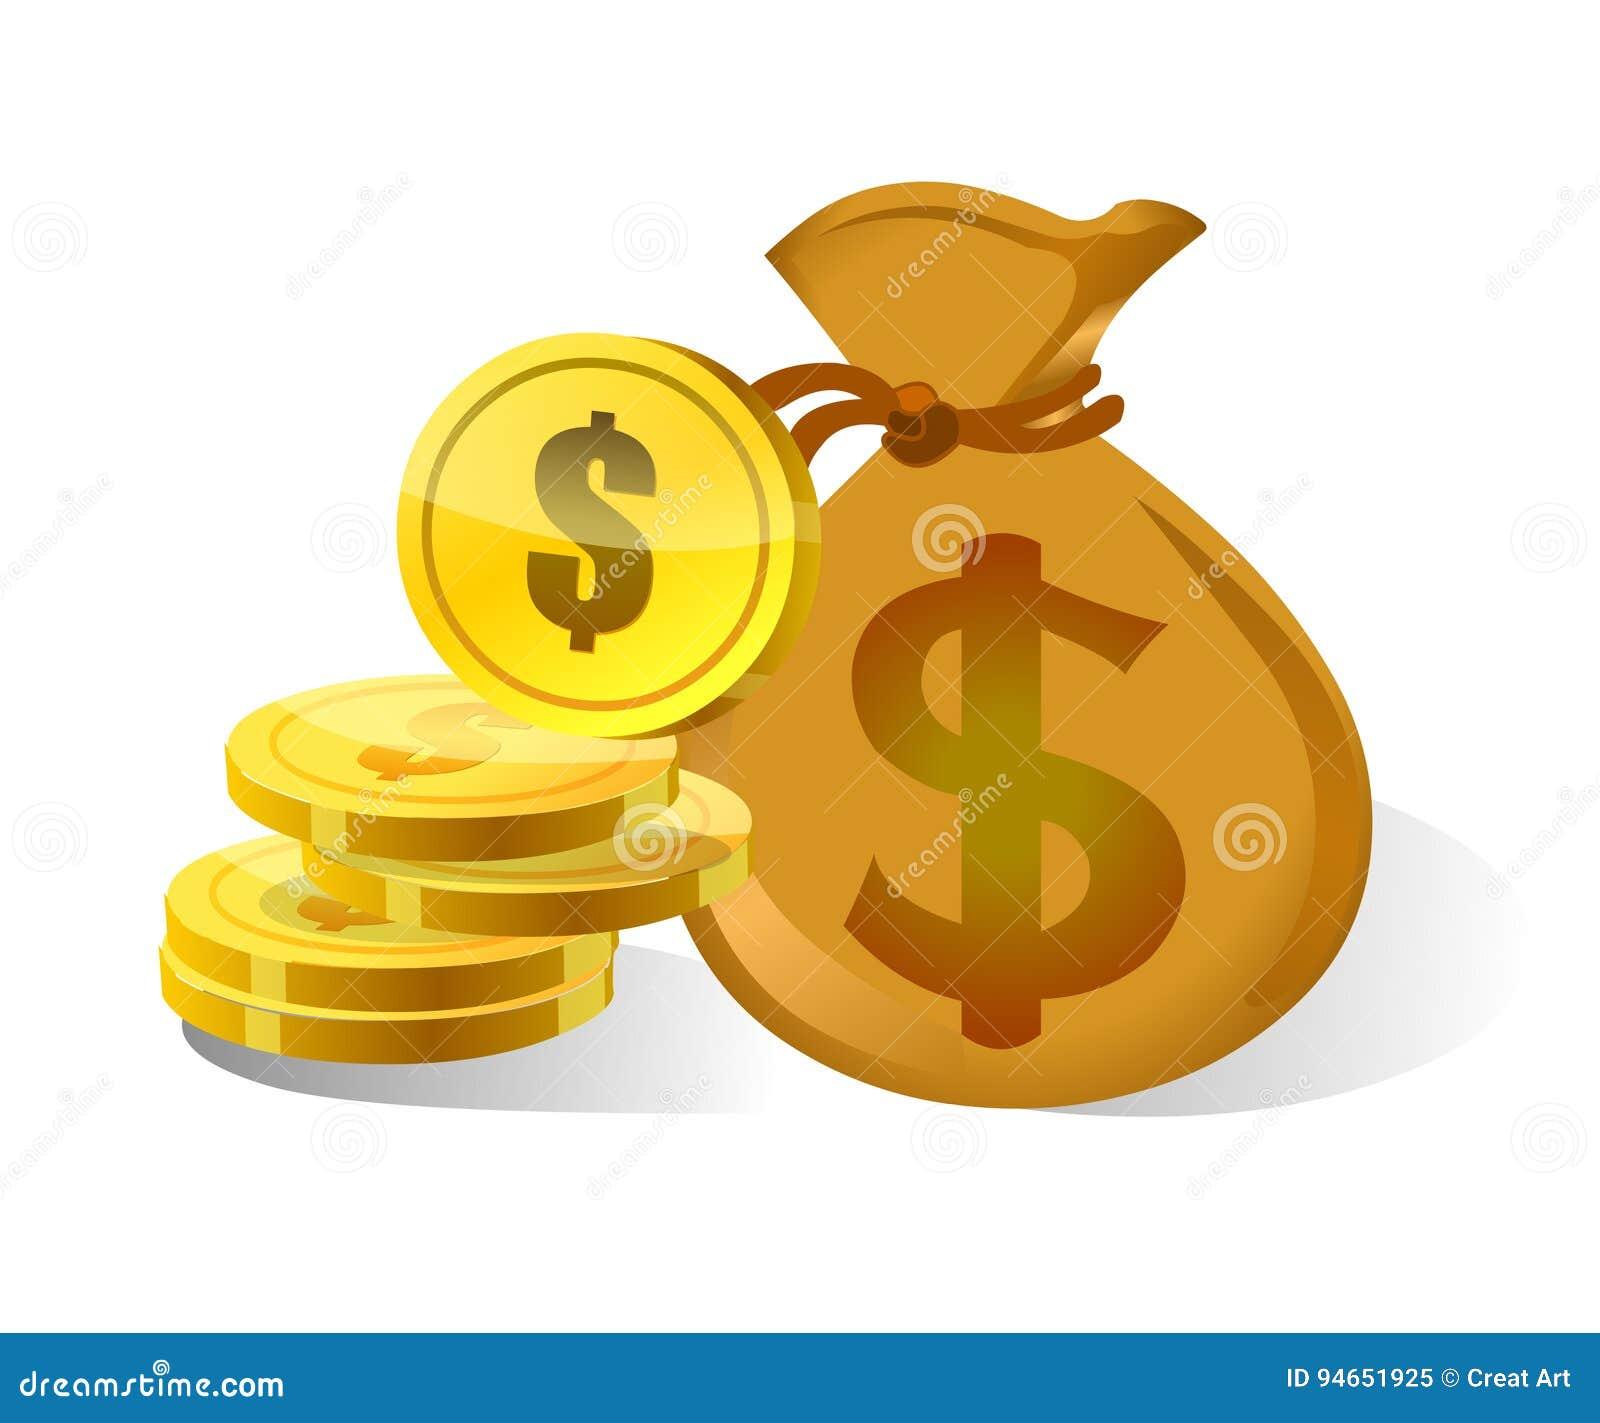 Dollar money bag and icon